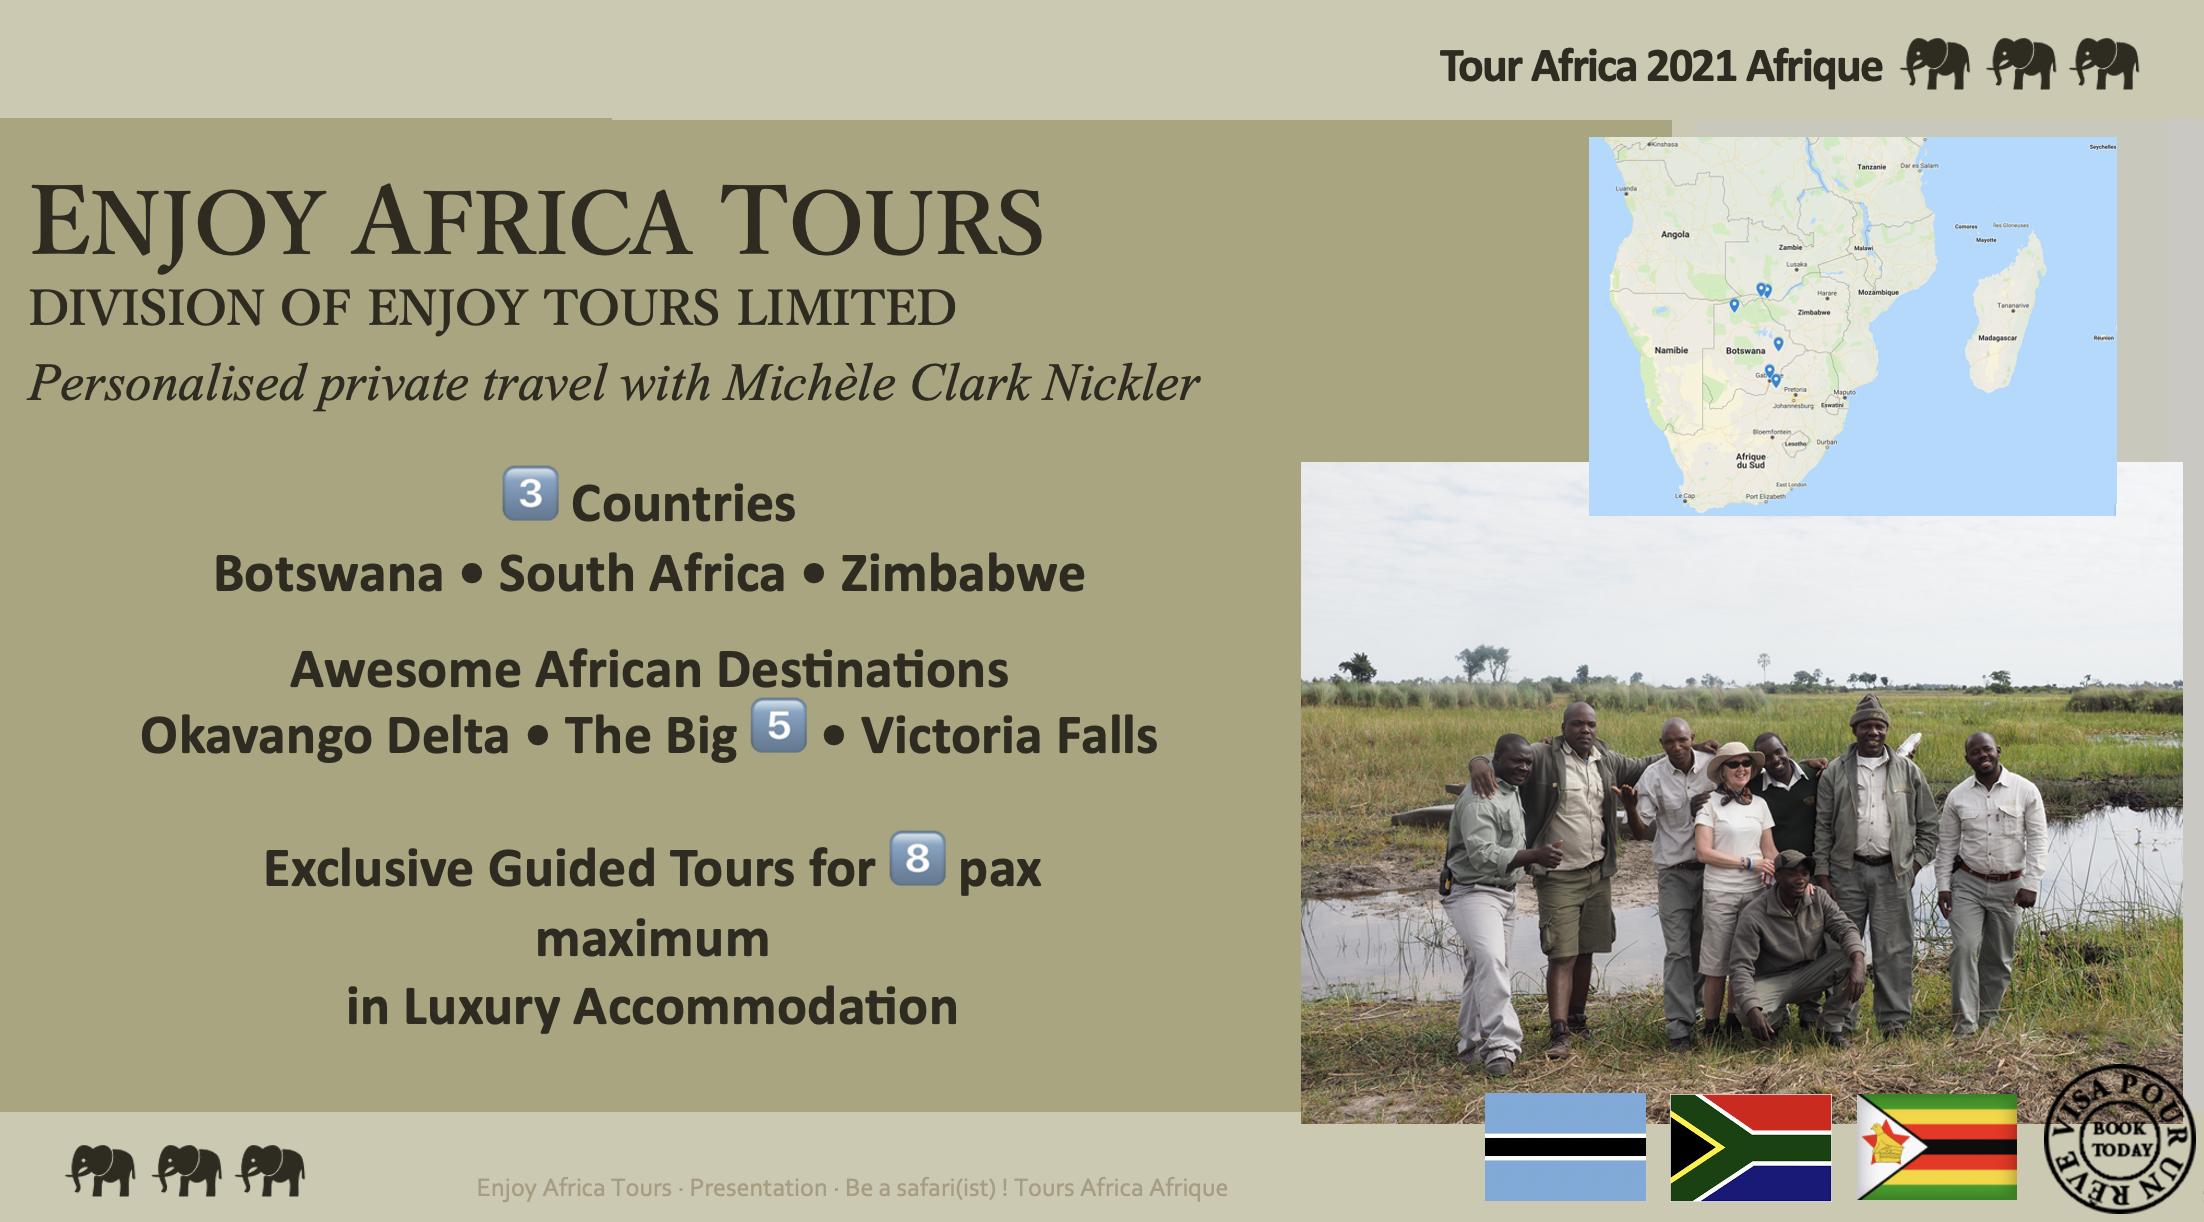 Enjoy Africa Tours 2021 Website Pg 1